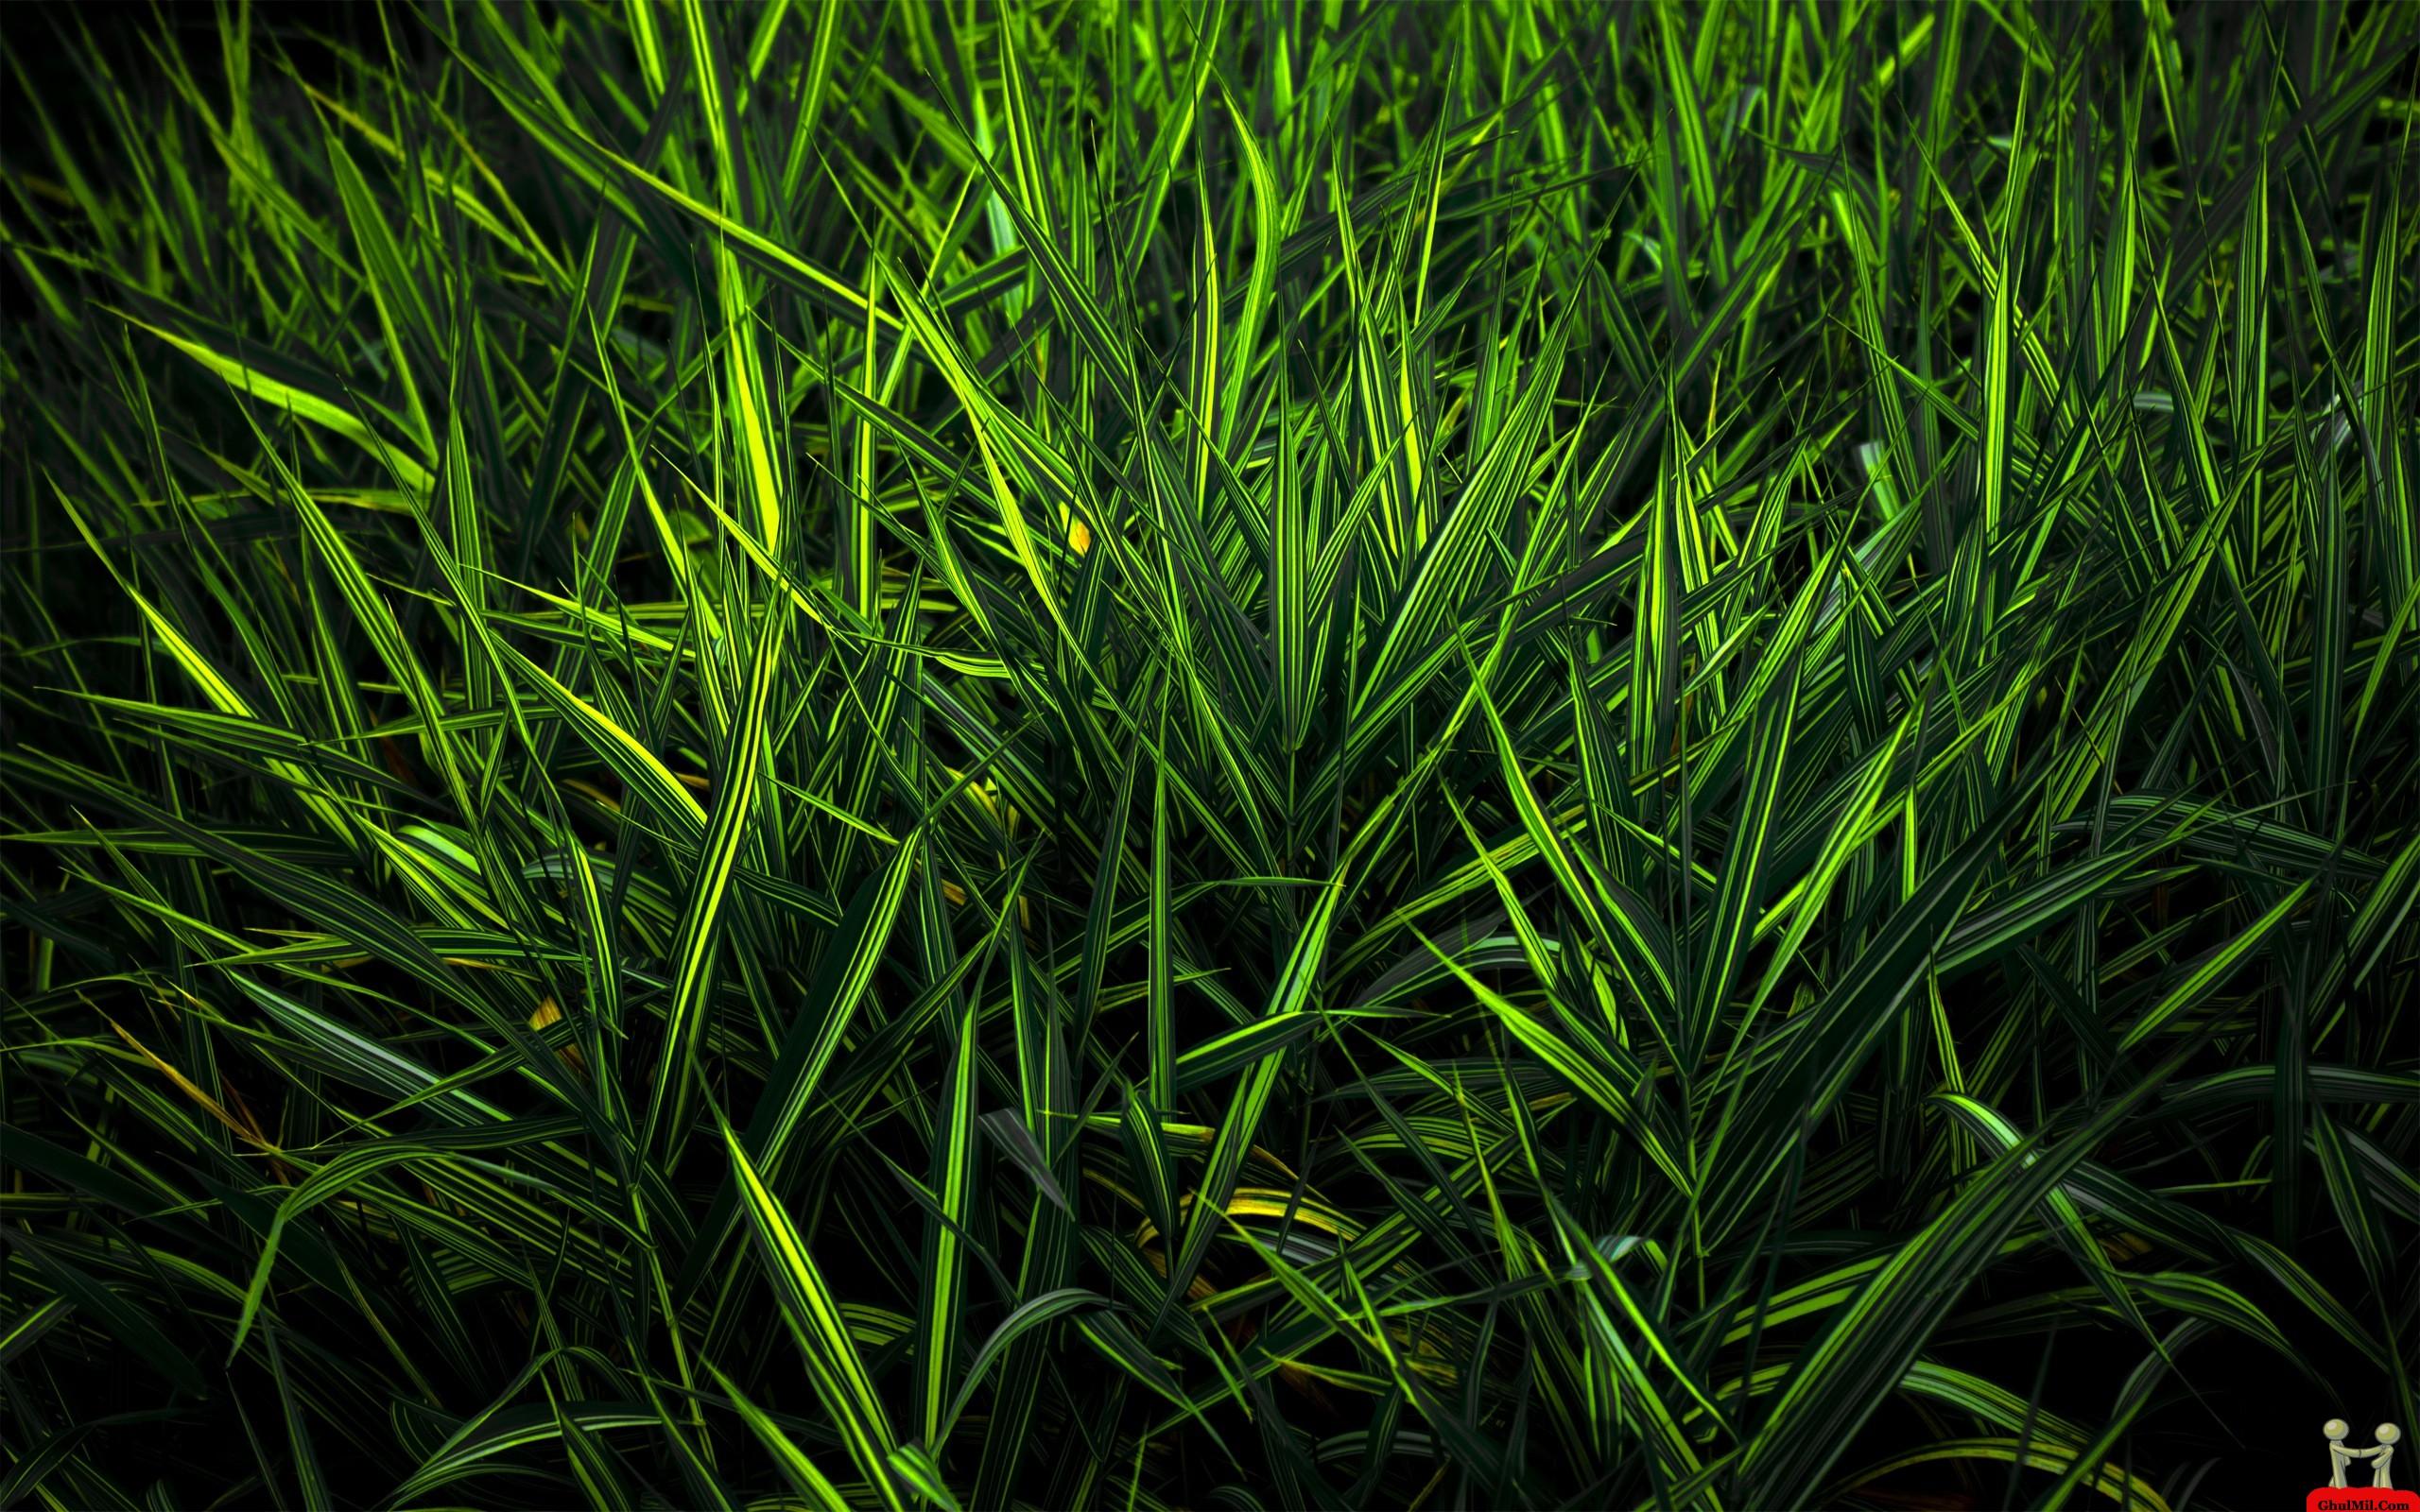 Hd wallpaper green - Pure Green Nature Spike Hd Wallpaper Hd Wallpapers Free Download